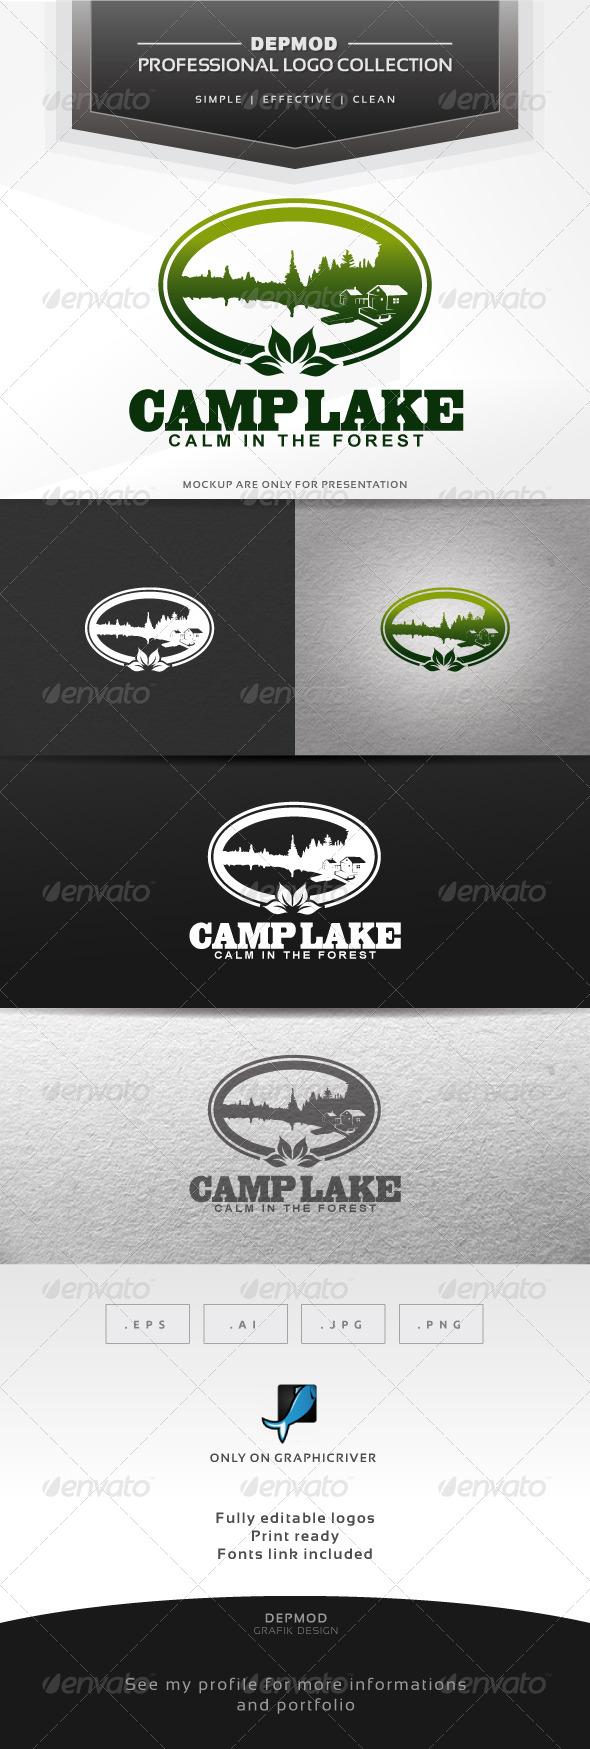 Camp Lake Logo - Nature Logo Templates